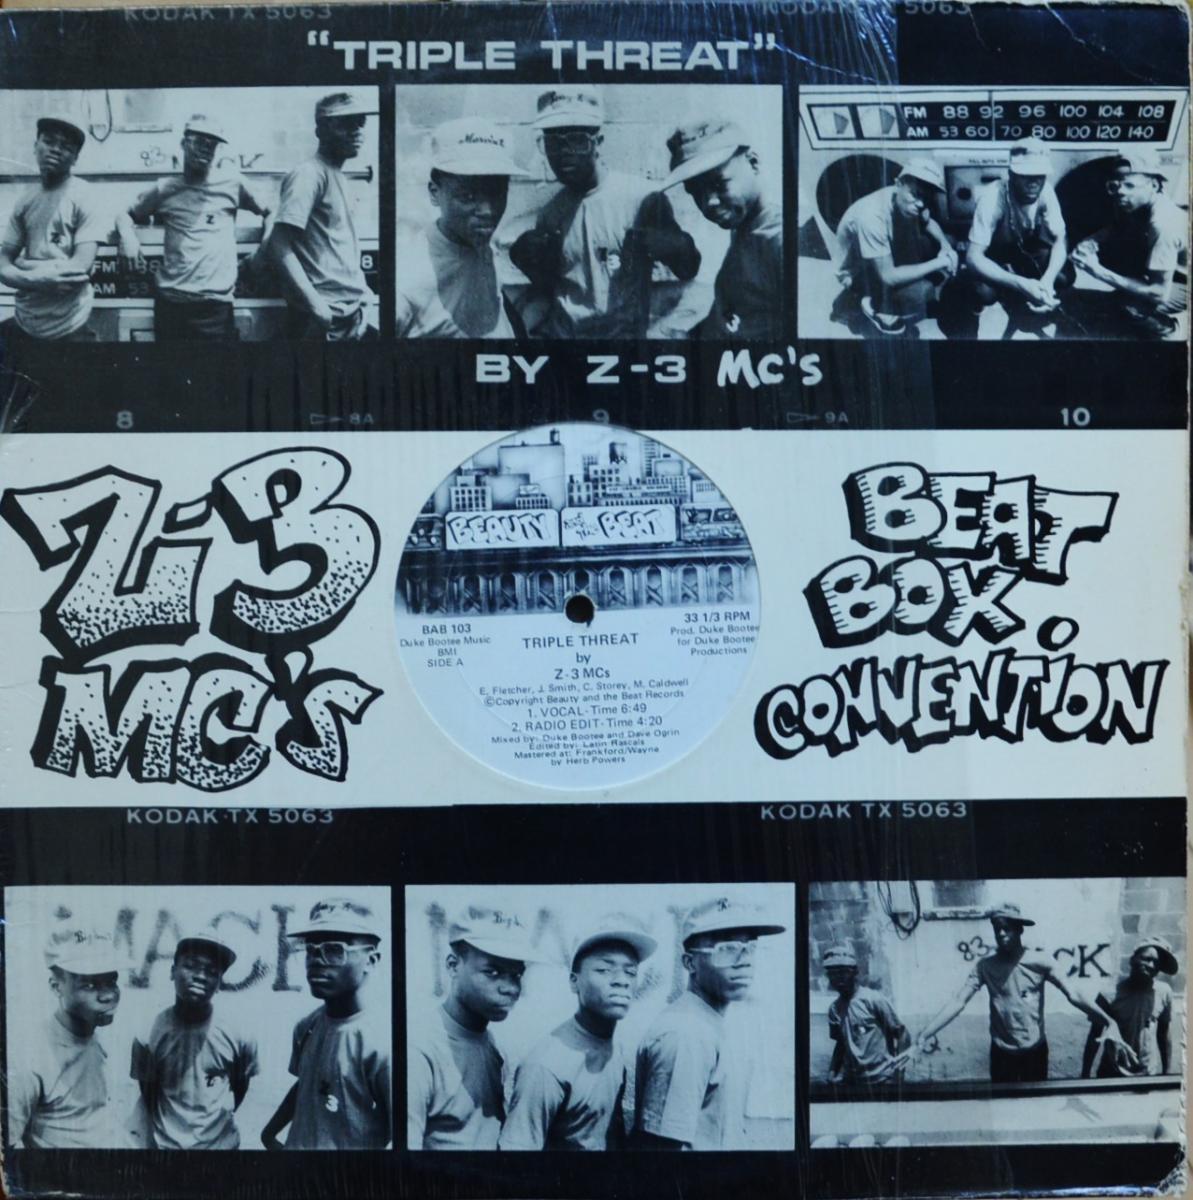 Z-3 MCs TRIPLE THREAT (12